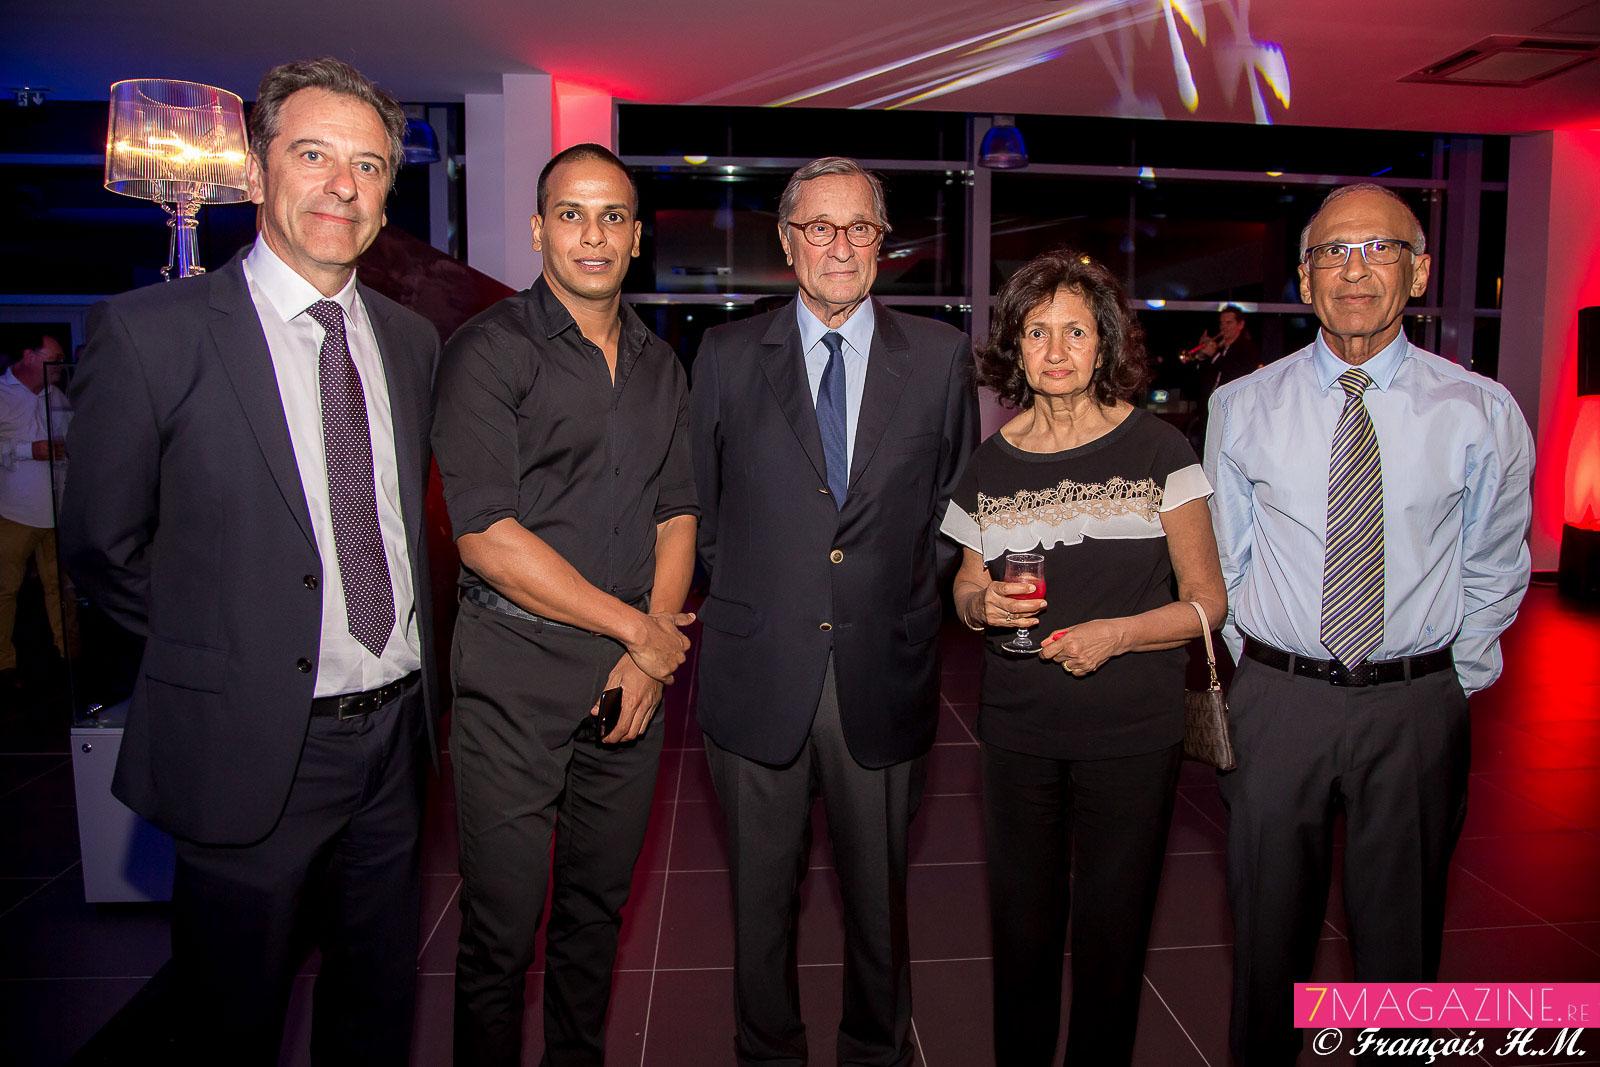 Michel Lapeyre, directeur général GBH Océan Indien, Hassen Cadjee, Bernard Hayot, Rabia Karodia, et Abdoul Cadjee